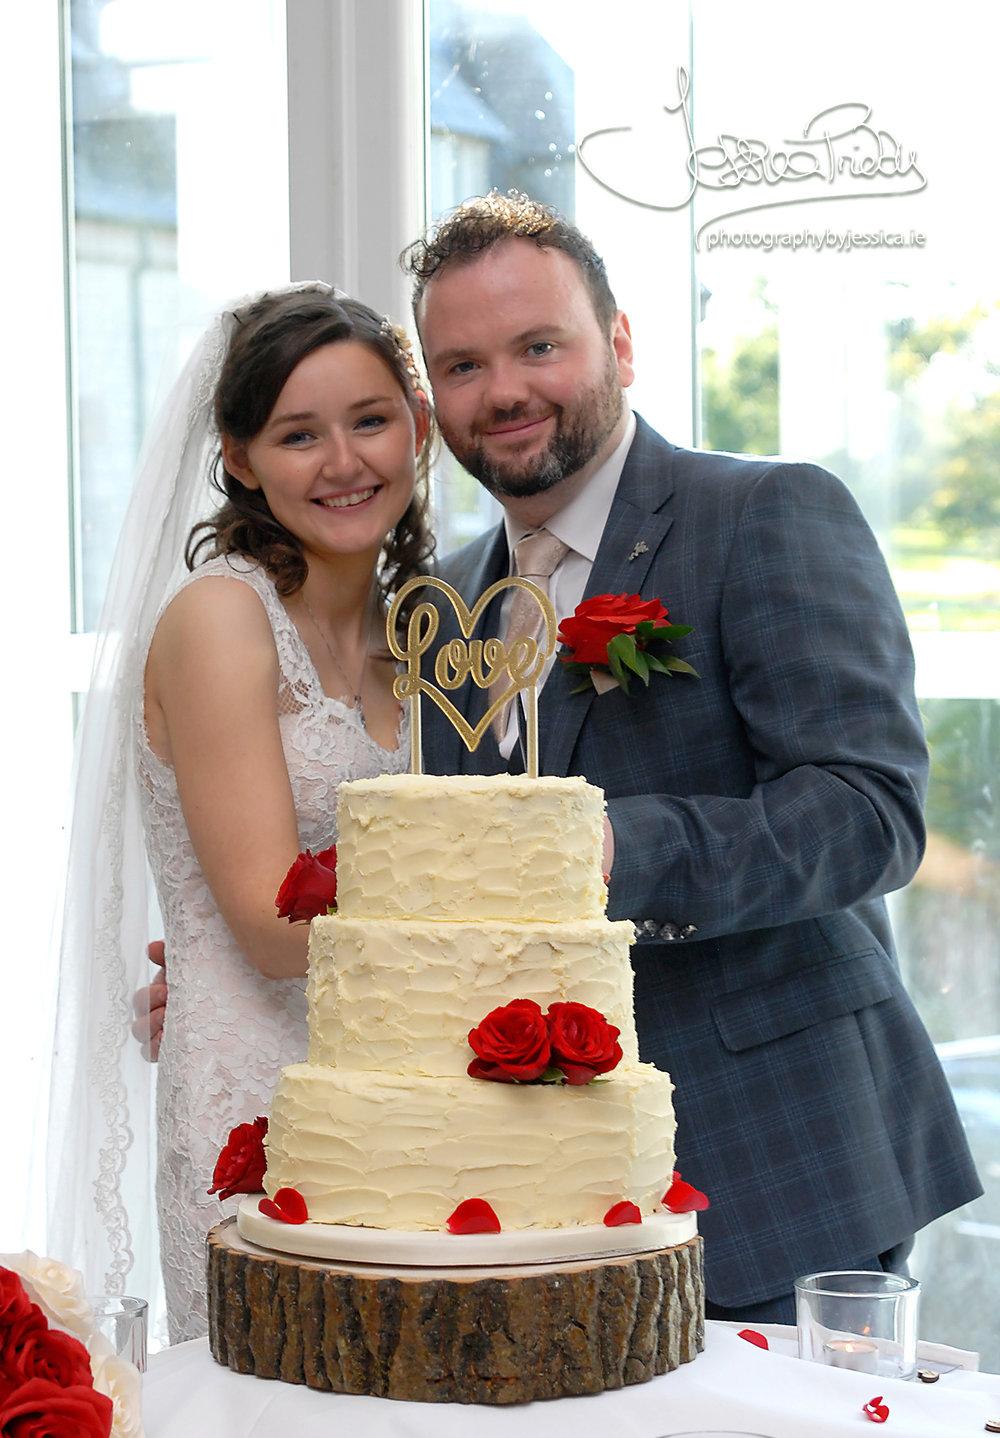 A simple, but beautiful wedding cake